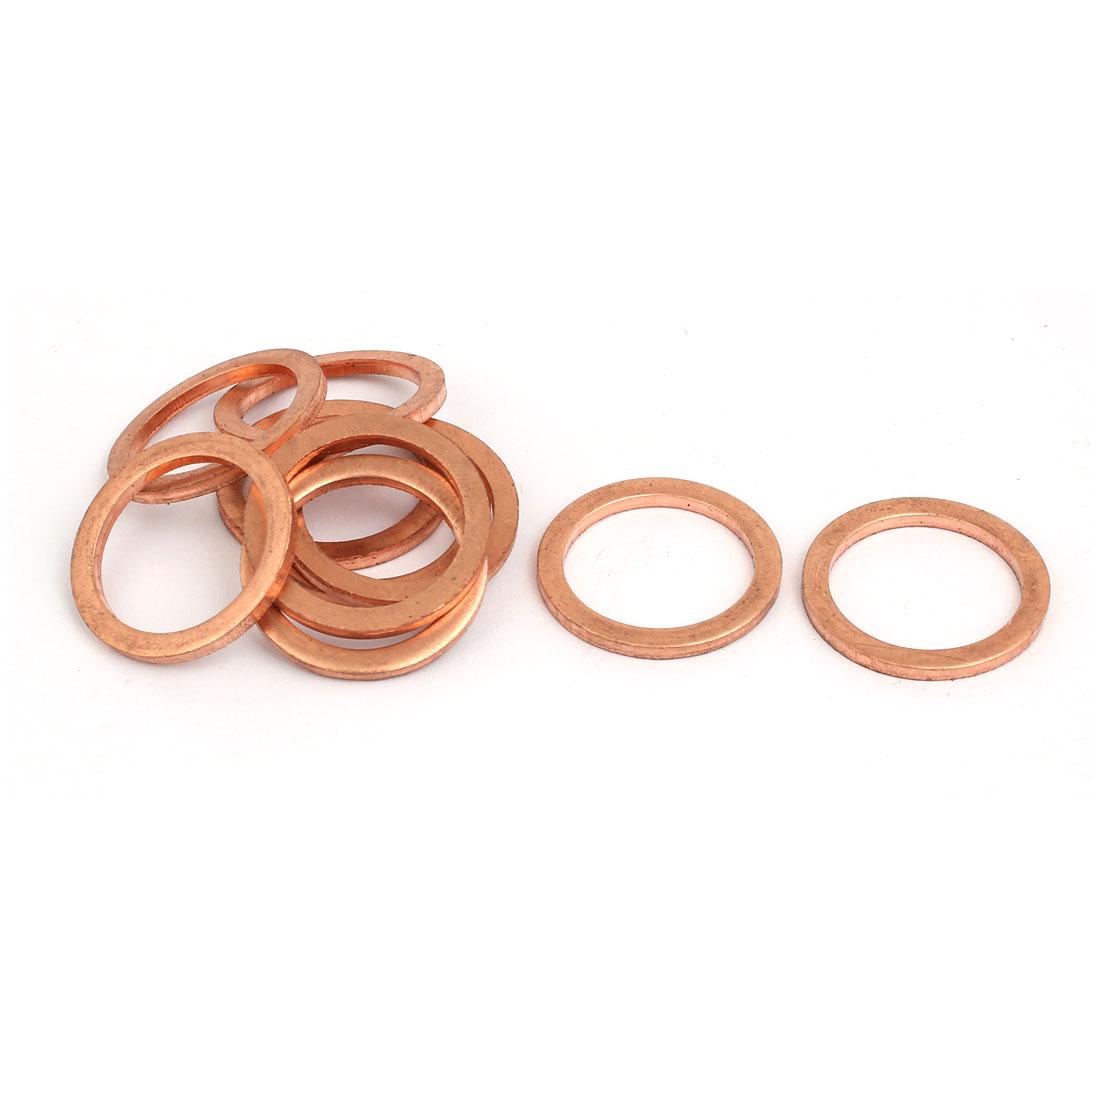 10pcs 20mmx26mmx2mm Copper Flat Ring Sealing Crush Washer Gasket